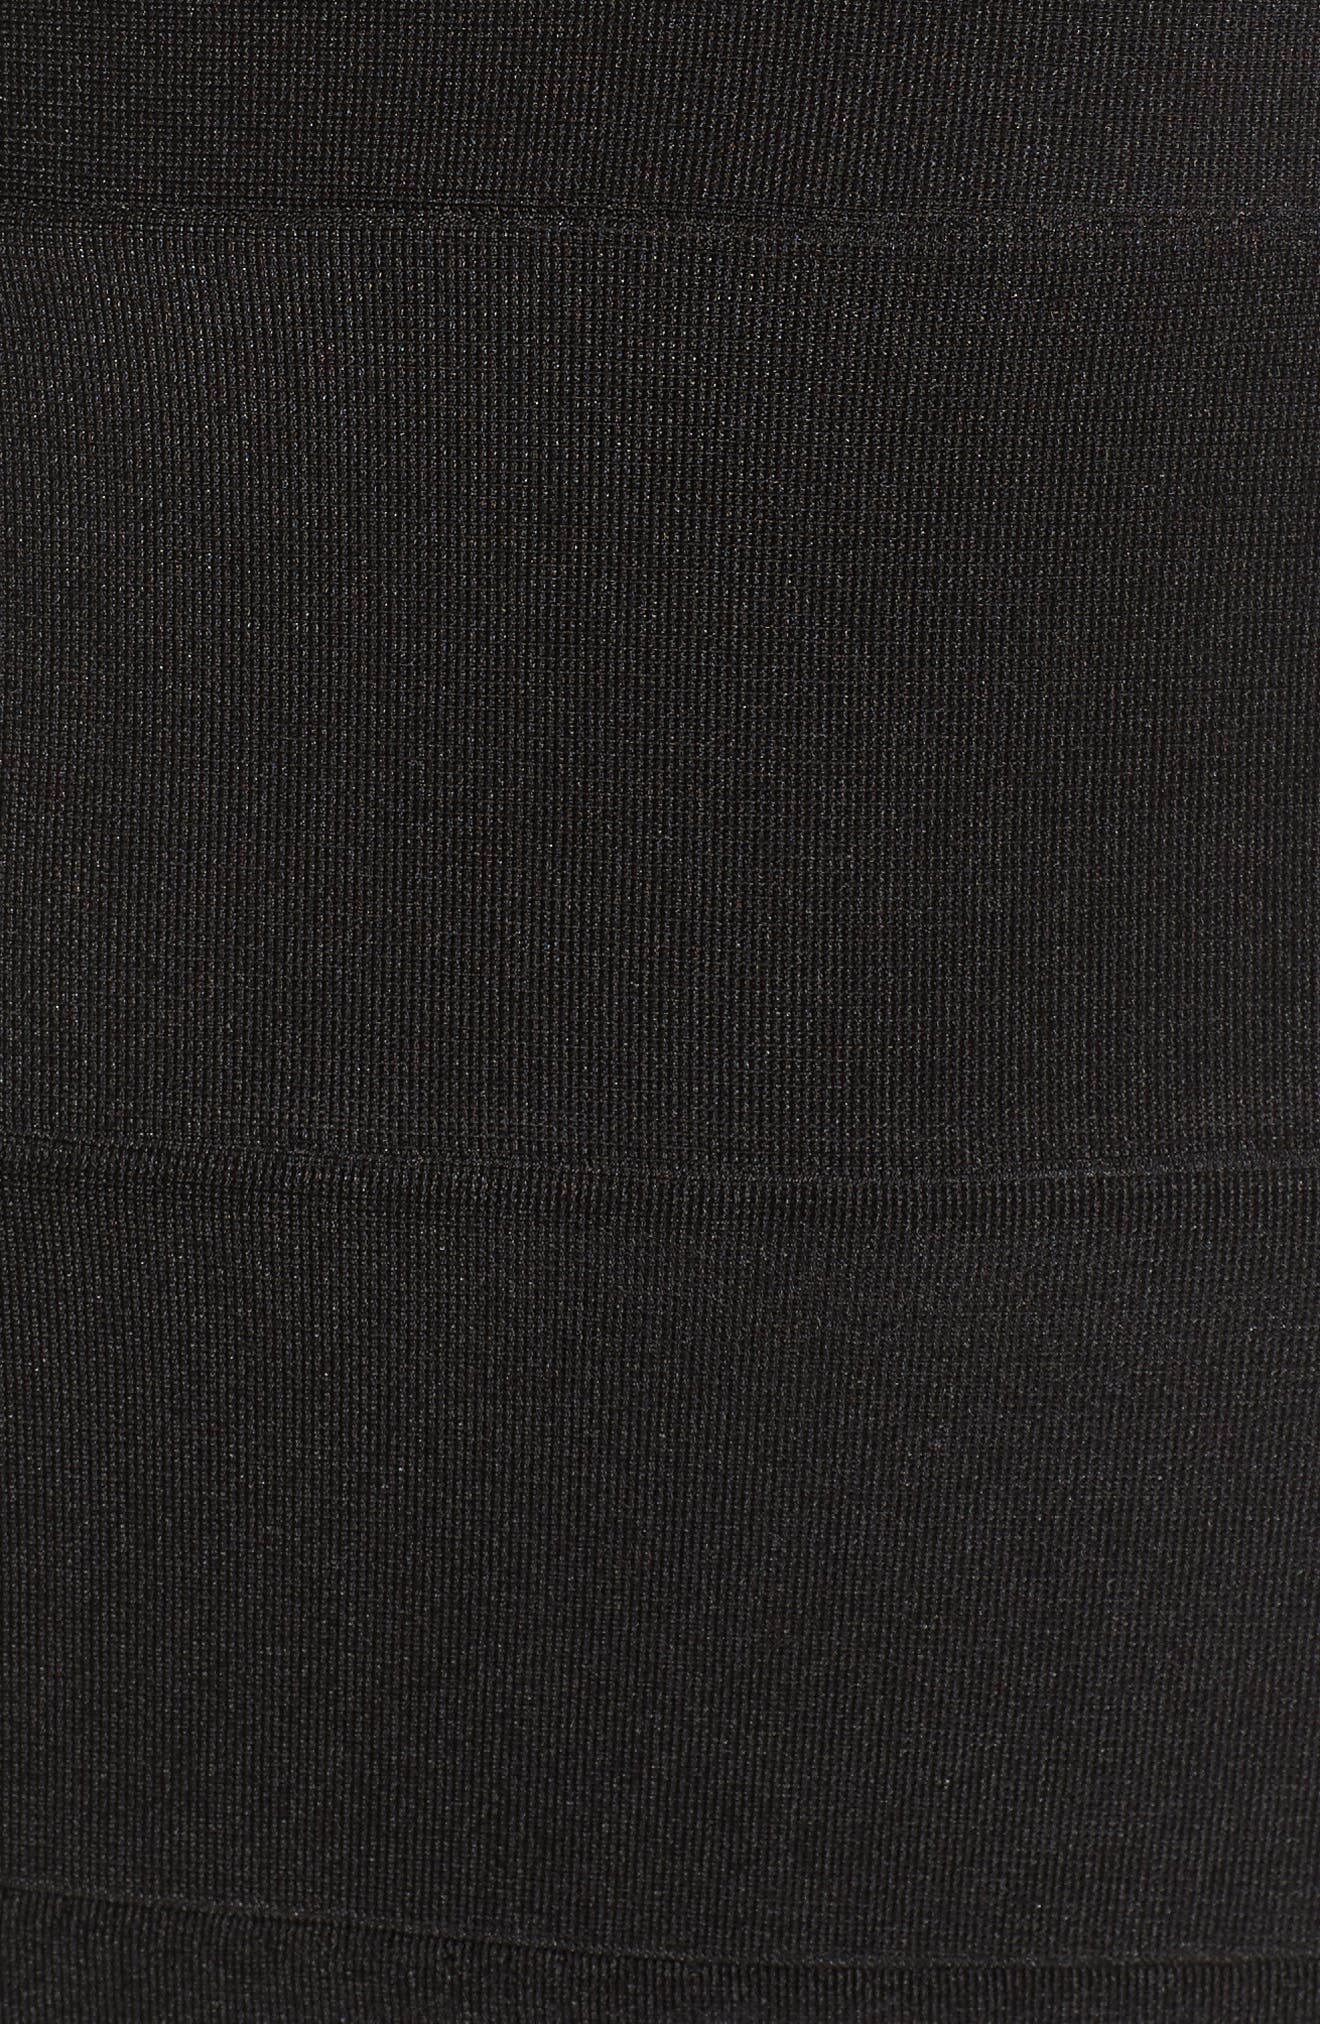 Lace Back Body-Con Dress,                             Alternate thumbnail 5, color,                             001